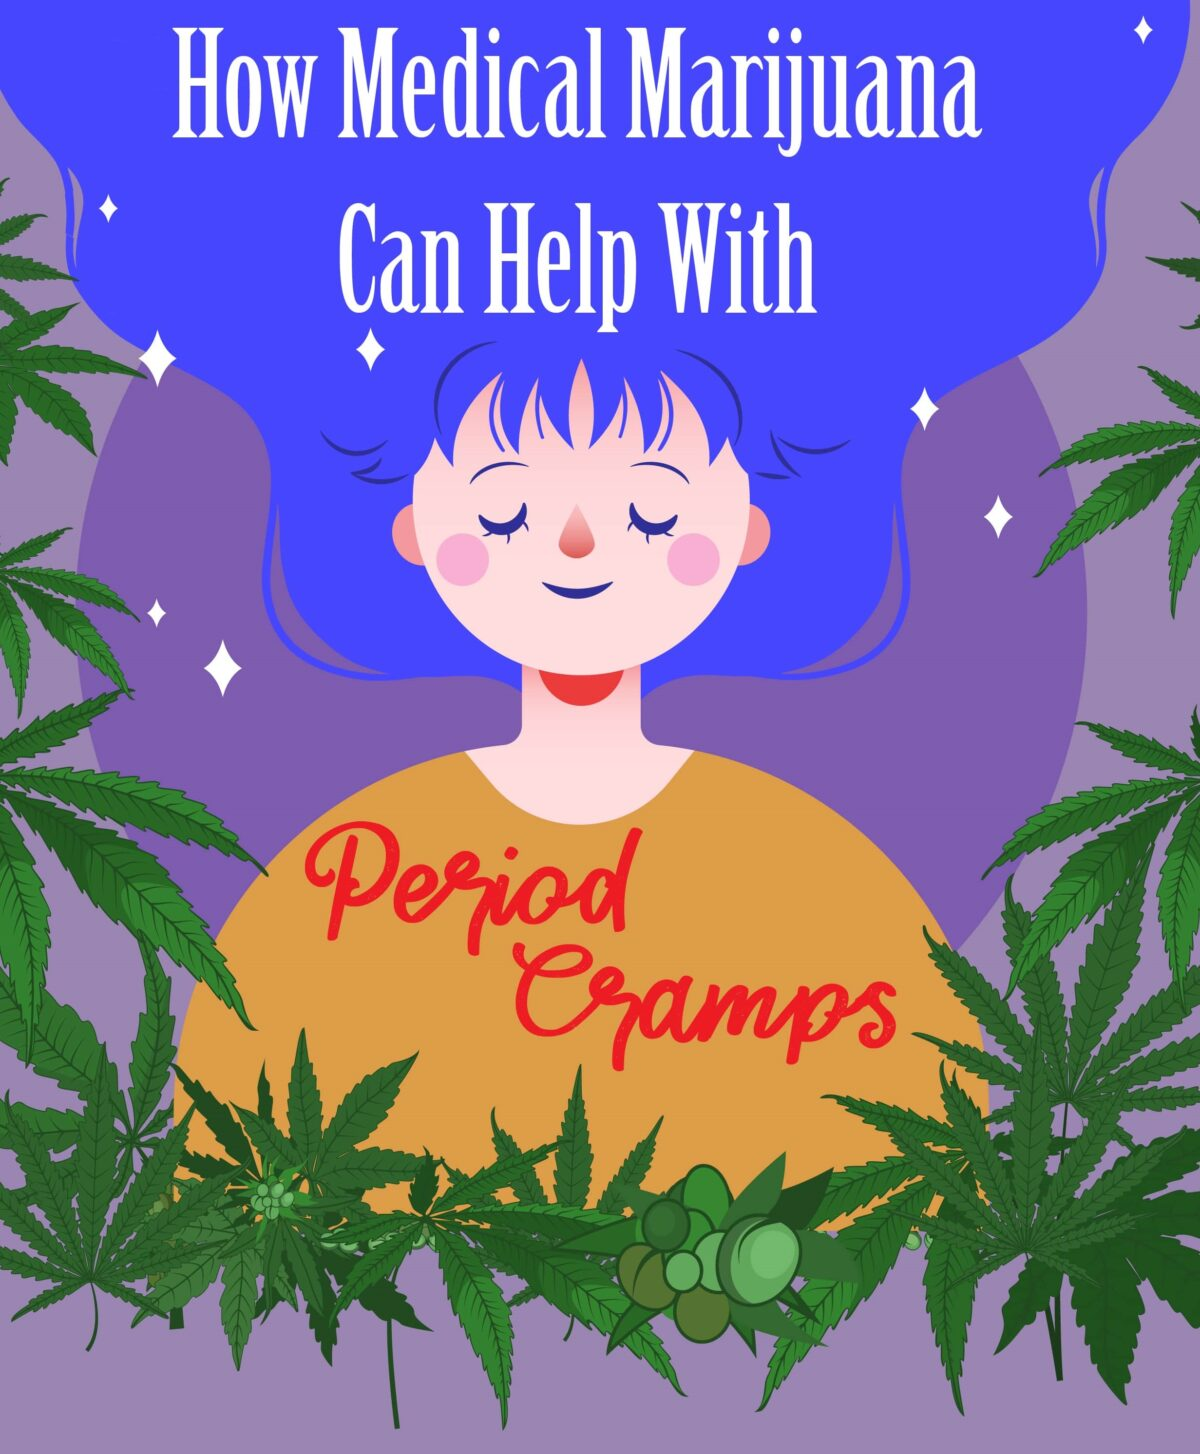 How Medical Marijuana Can Help With Period Cramps